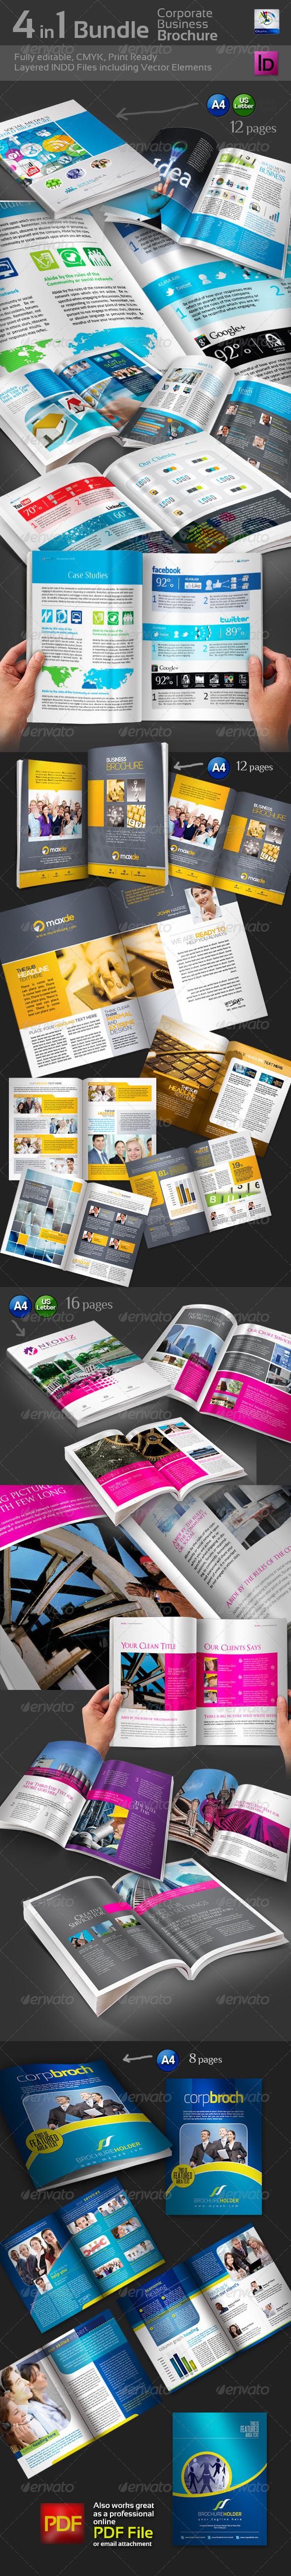 GraphicRiver 4 in 1 Bundle Bi-Fold Brochure 3614406